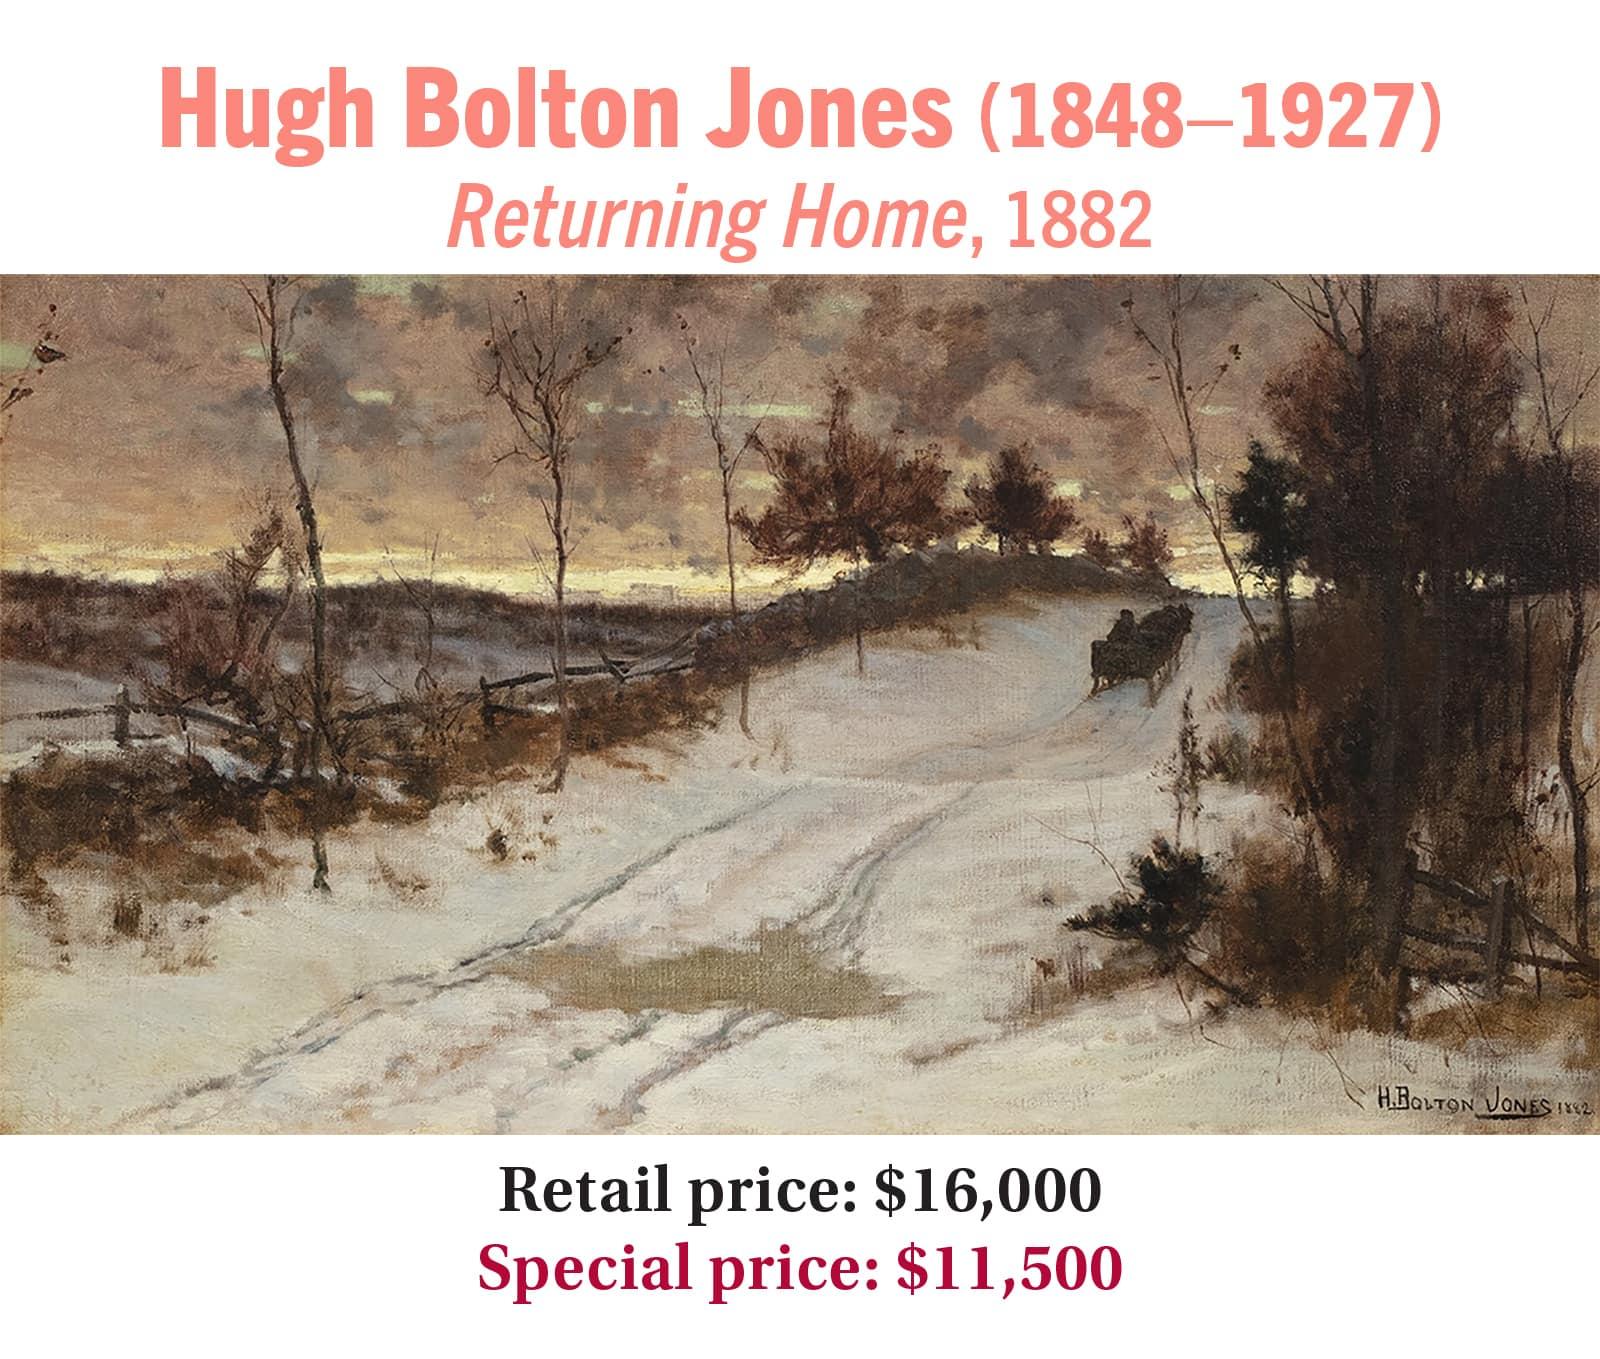 Hugh Bolton Jones (1848–1927), Returning Home, 1882, oil on canvas, American tonalist landscape painting